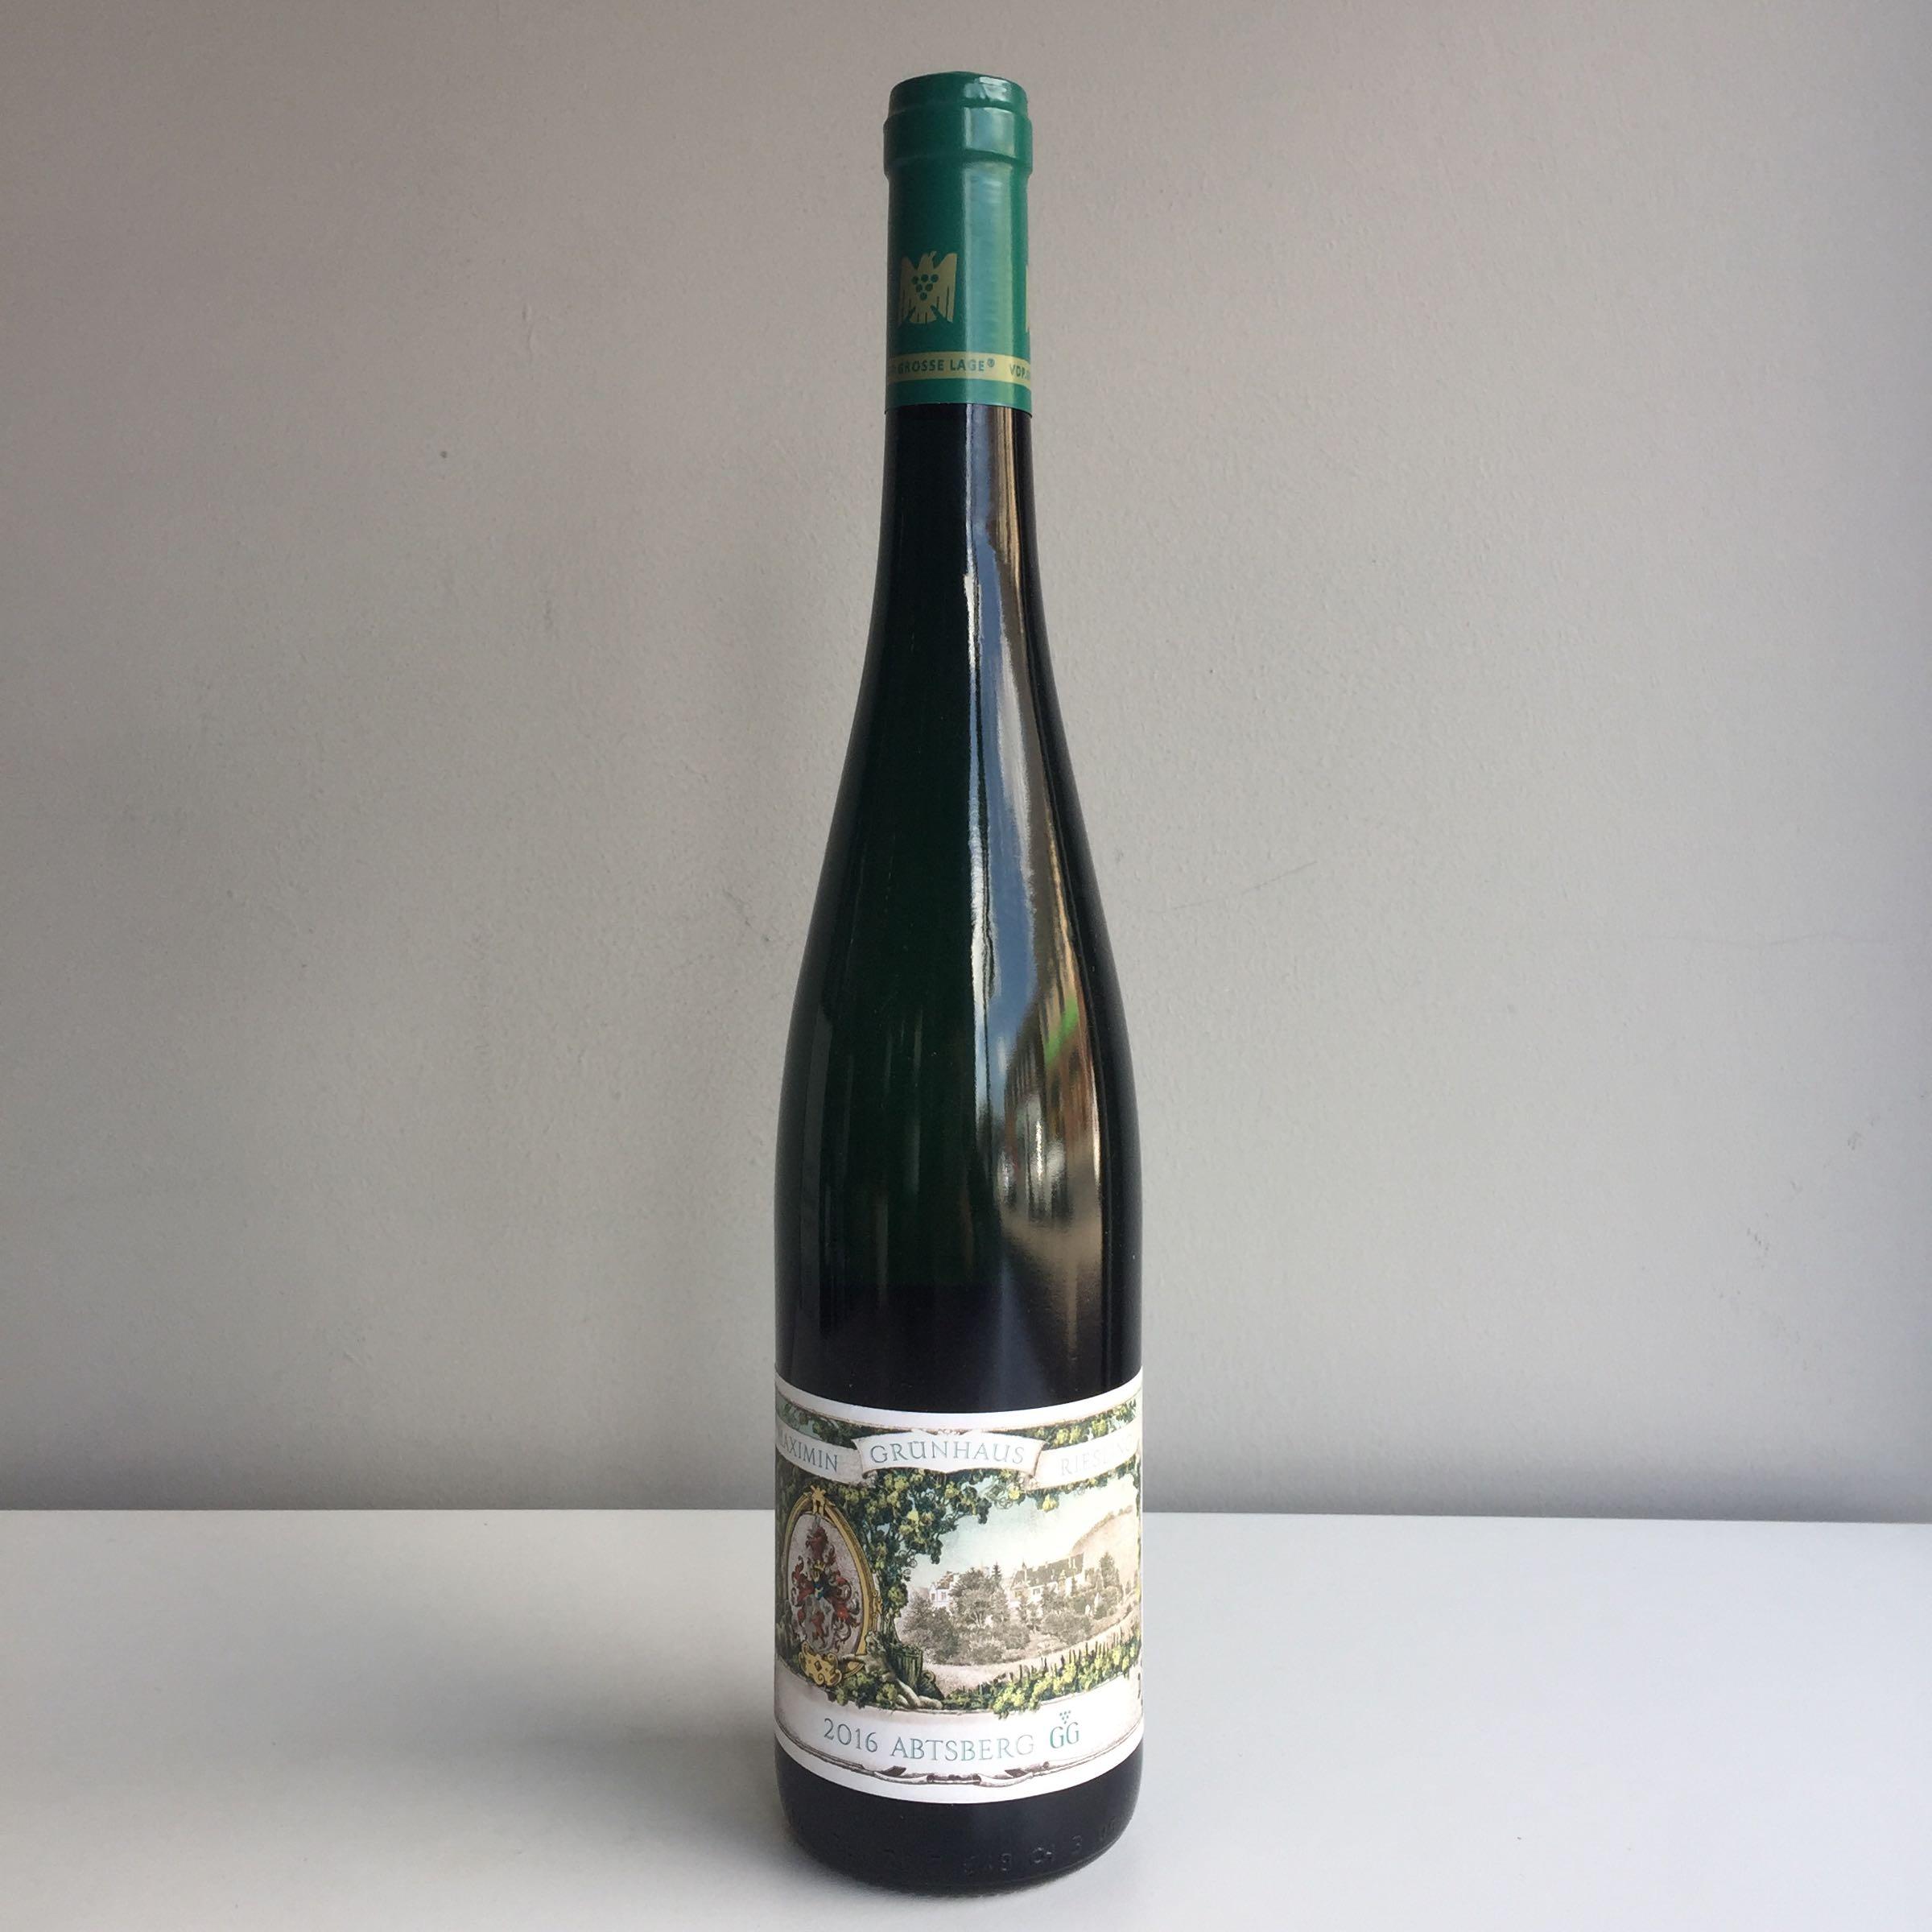 Maximin Grunhaus - Riesling - Abtsberg GG